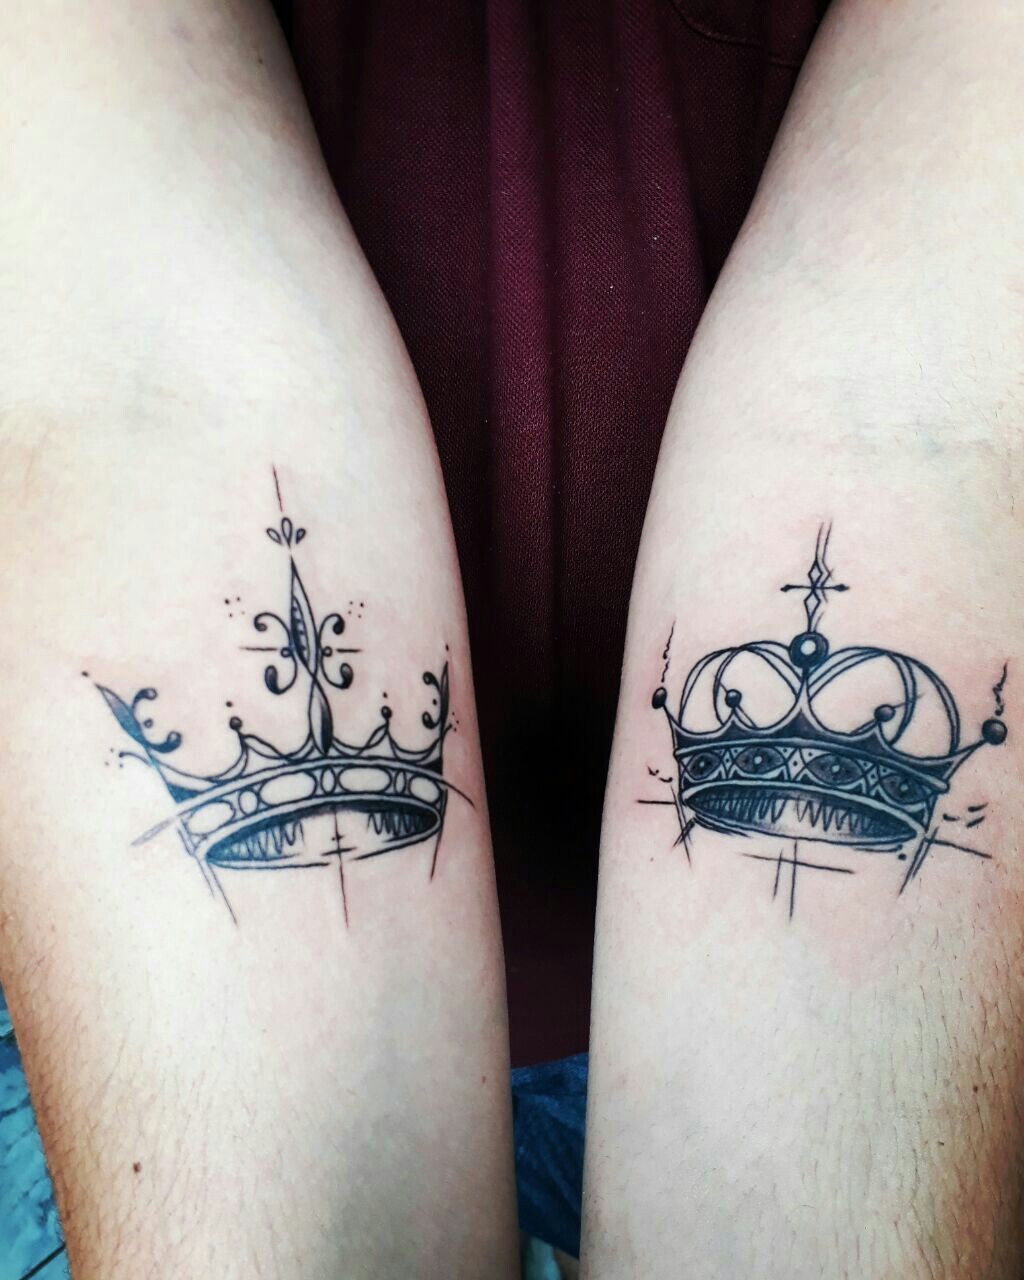 2c8672cc9 KING / QUEEN King Queen Tattoo, King Crown Tattoo, Kings & Queens, Tattoos